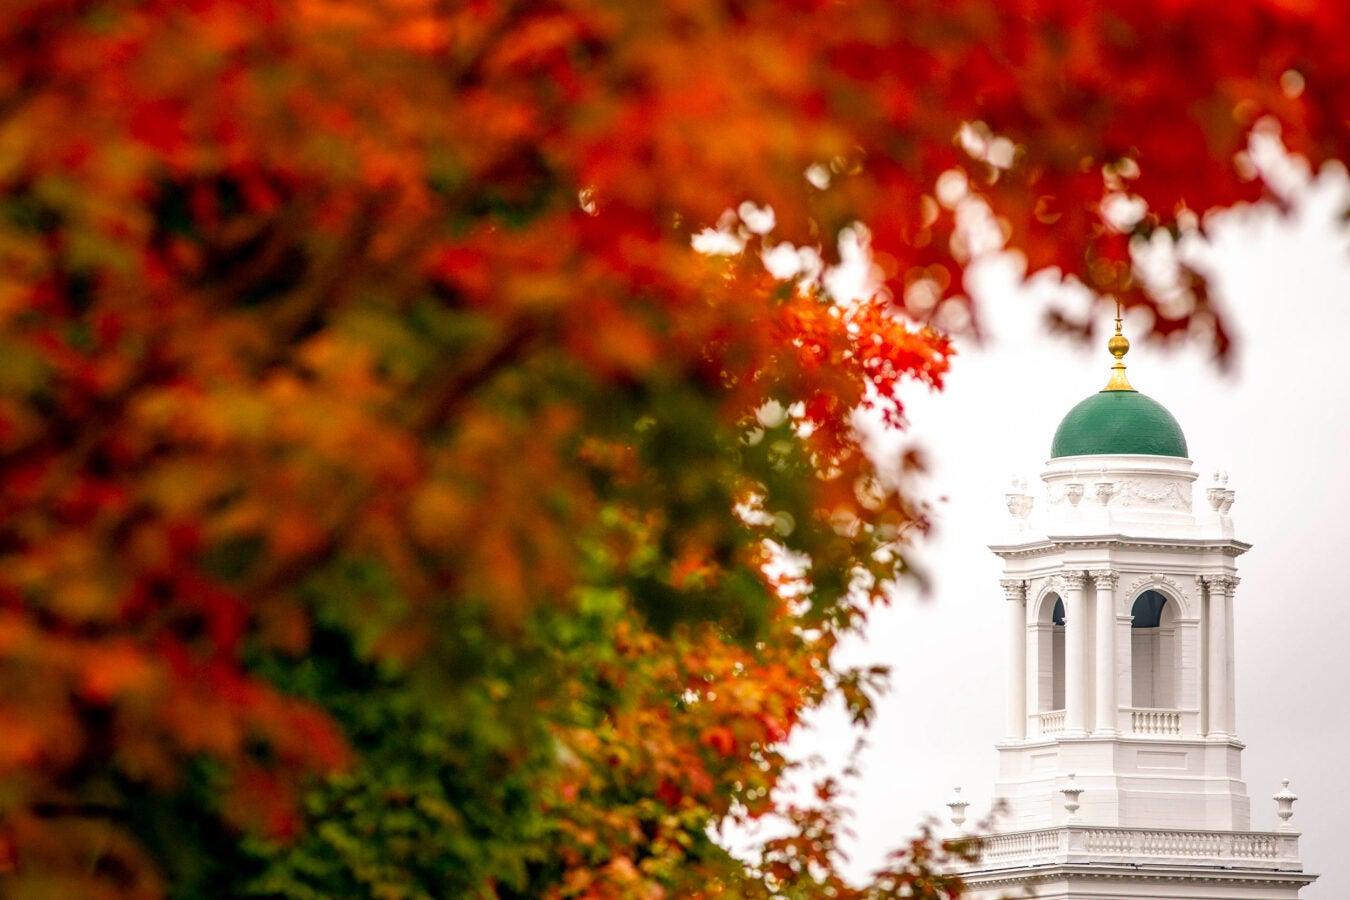 Harvard tower seen through red fall foliage